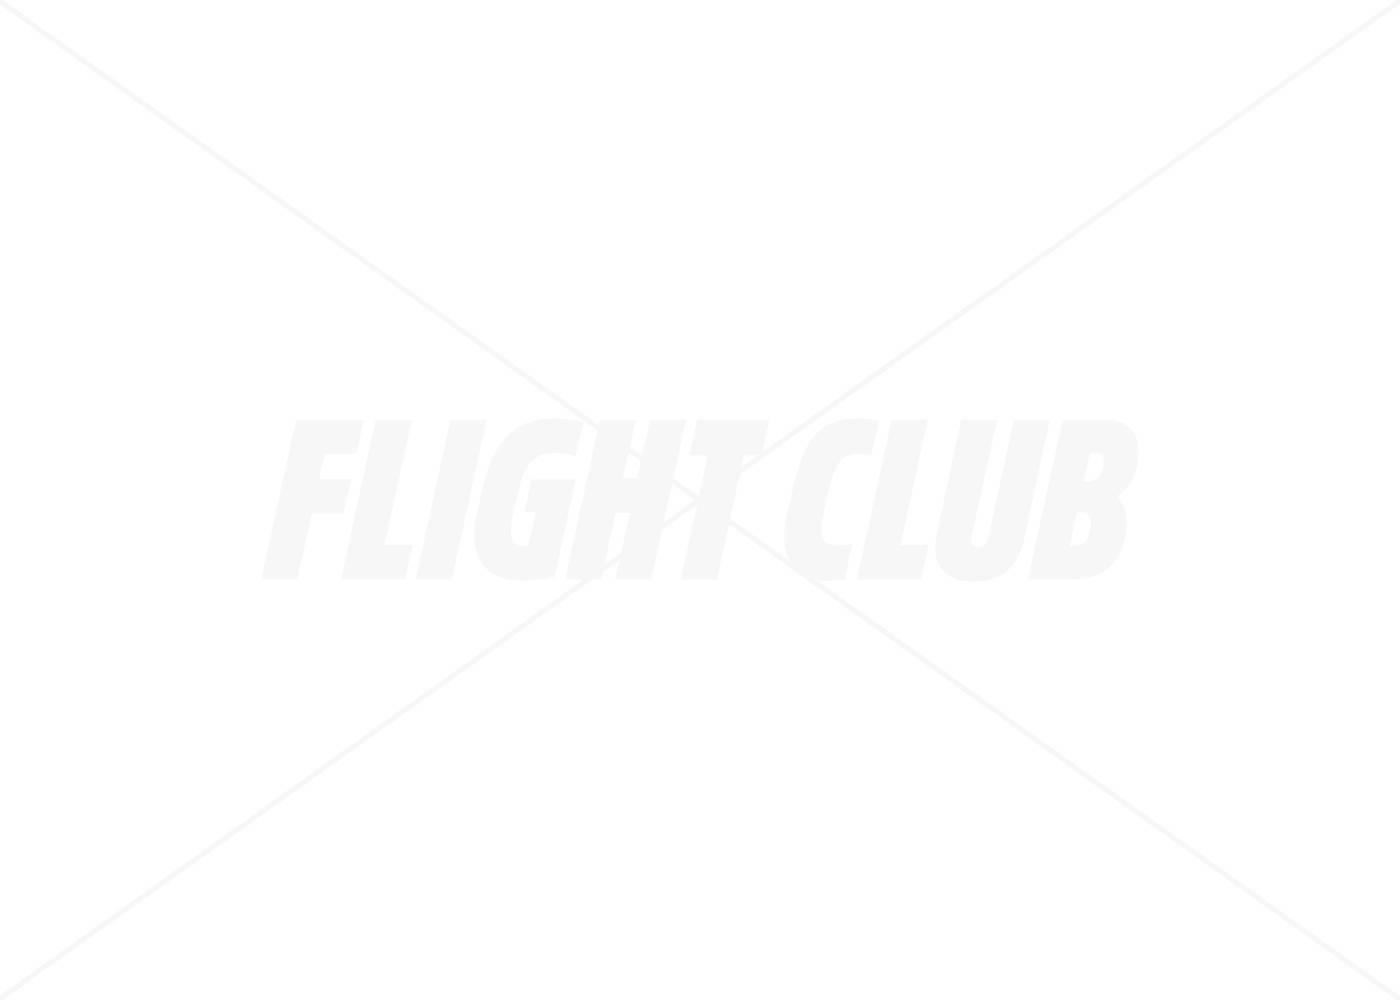 Club Club Club SneakersHereFlight Club SneakersHereFlight SneakersHereFlight SneakersHereFlight Club Club SneakersHereFlight SneakersHereFlight SneakersHereFlight ynwm8ON0vP